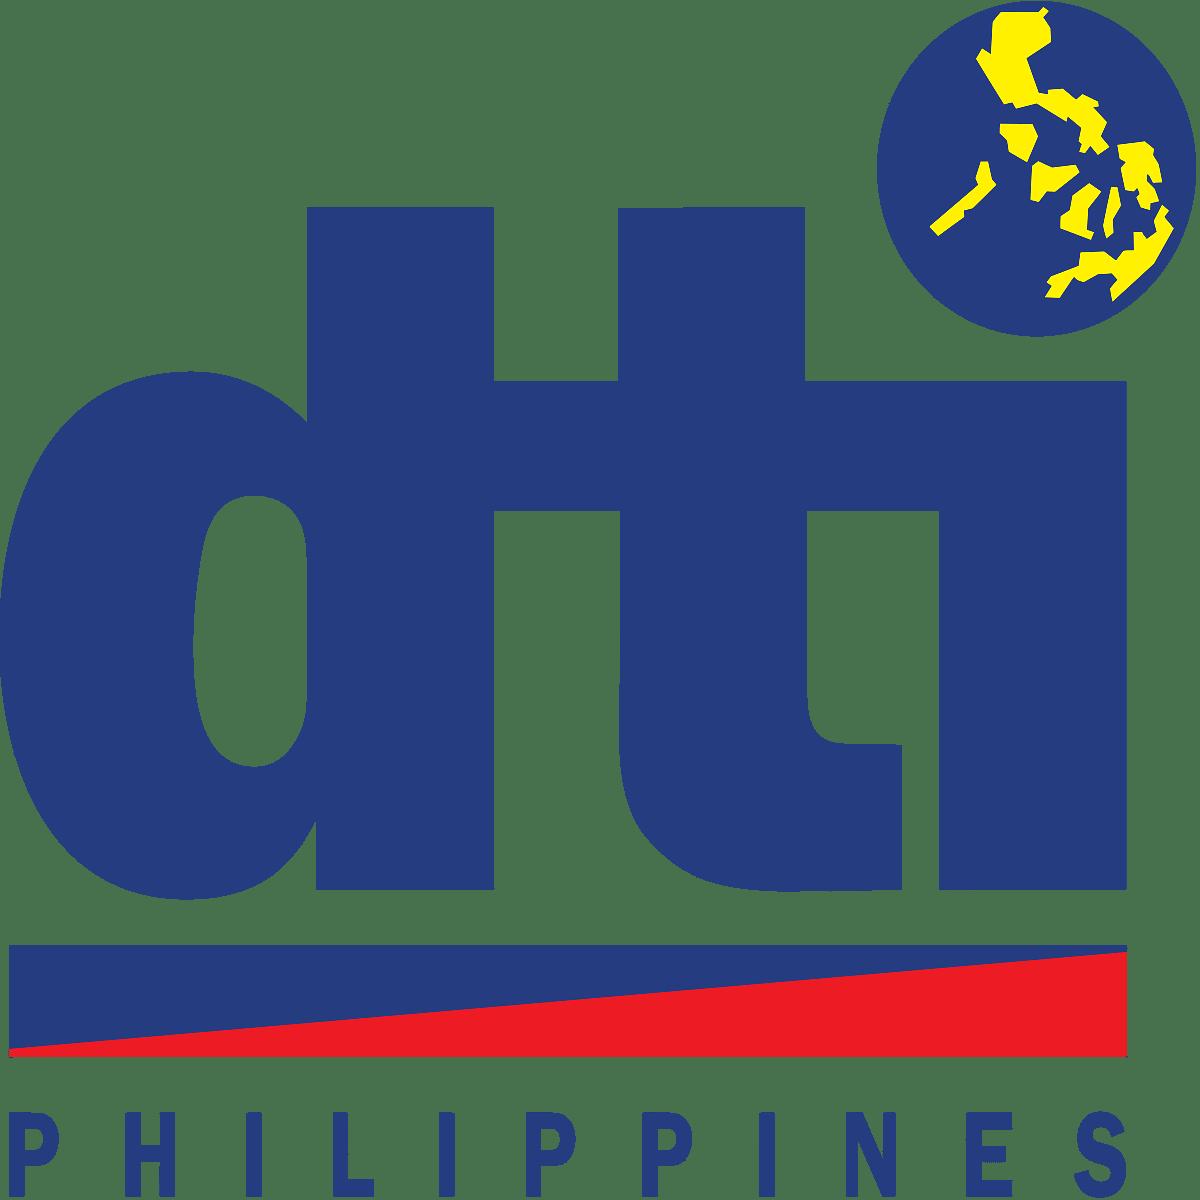 Philippines Terminates Safeguard Measure Probe on Coated Steel